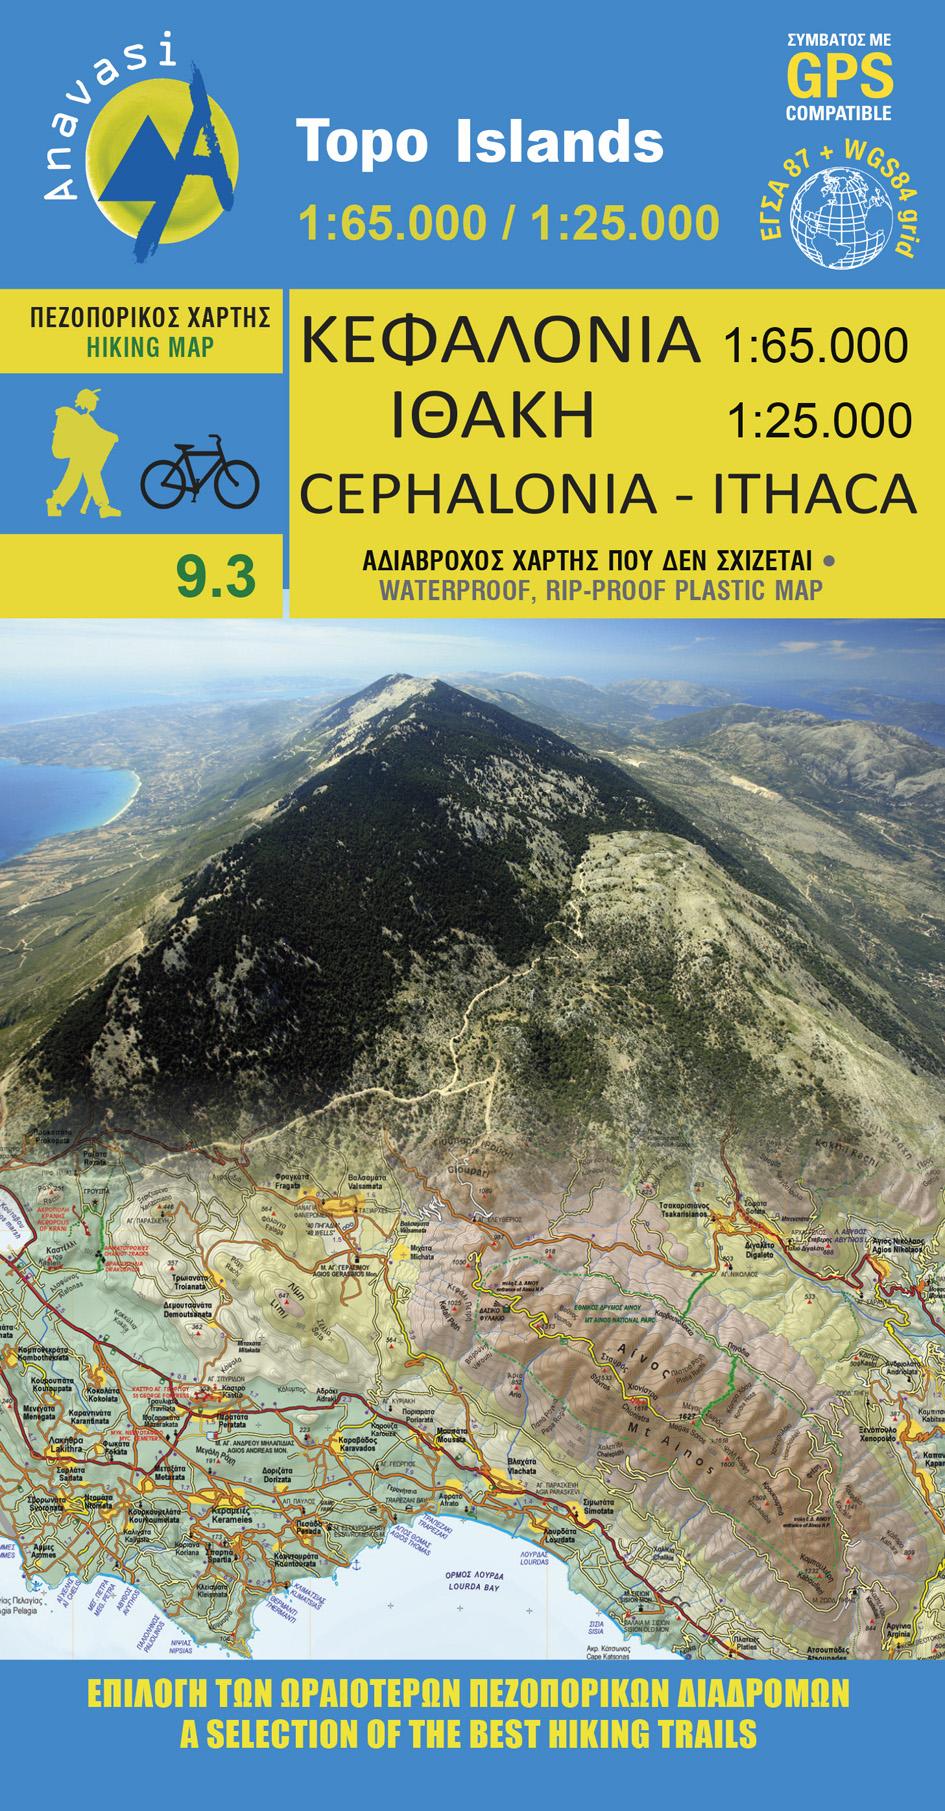 Cephalonia - Ithaca [9.3]